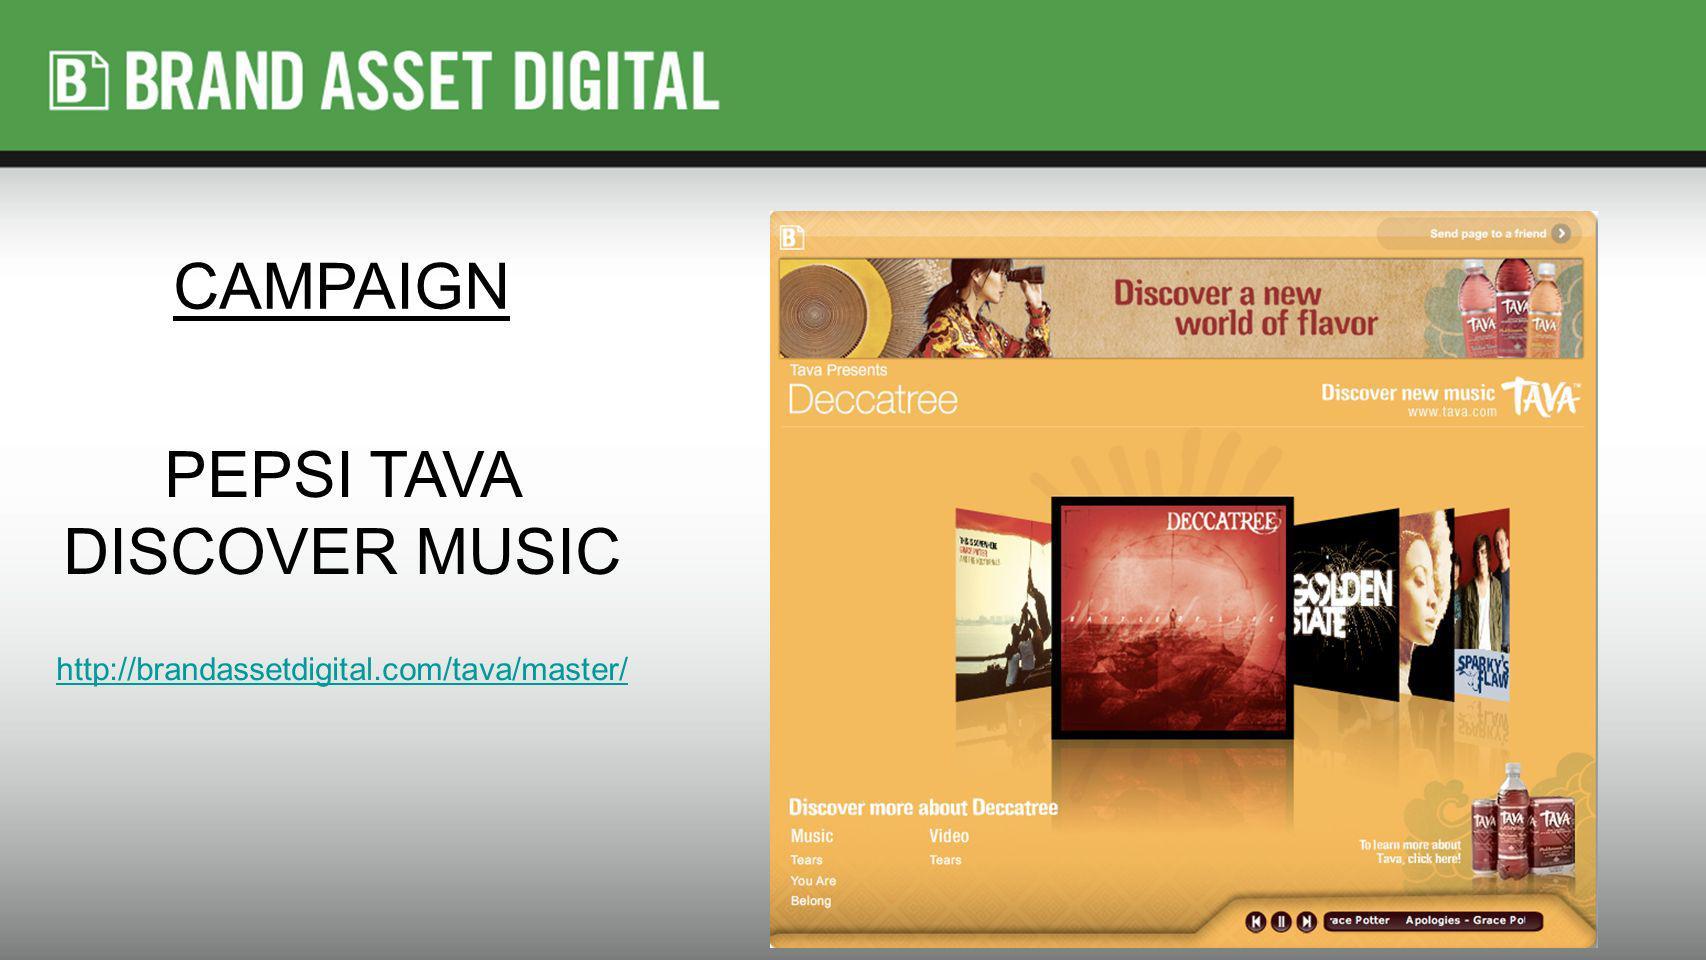 PEPSI TAVA DISCOVER MUSIC http://brandassetdigital.com/tava/master/